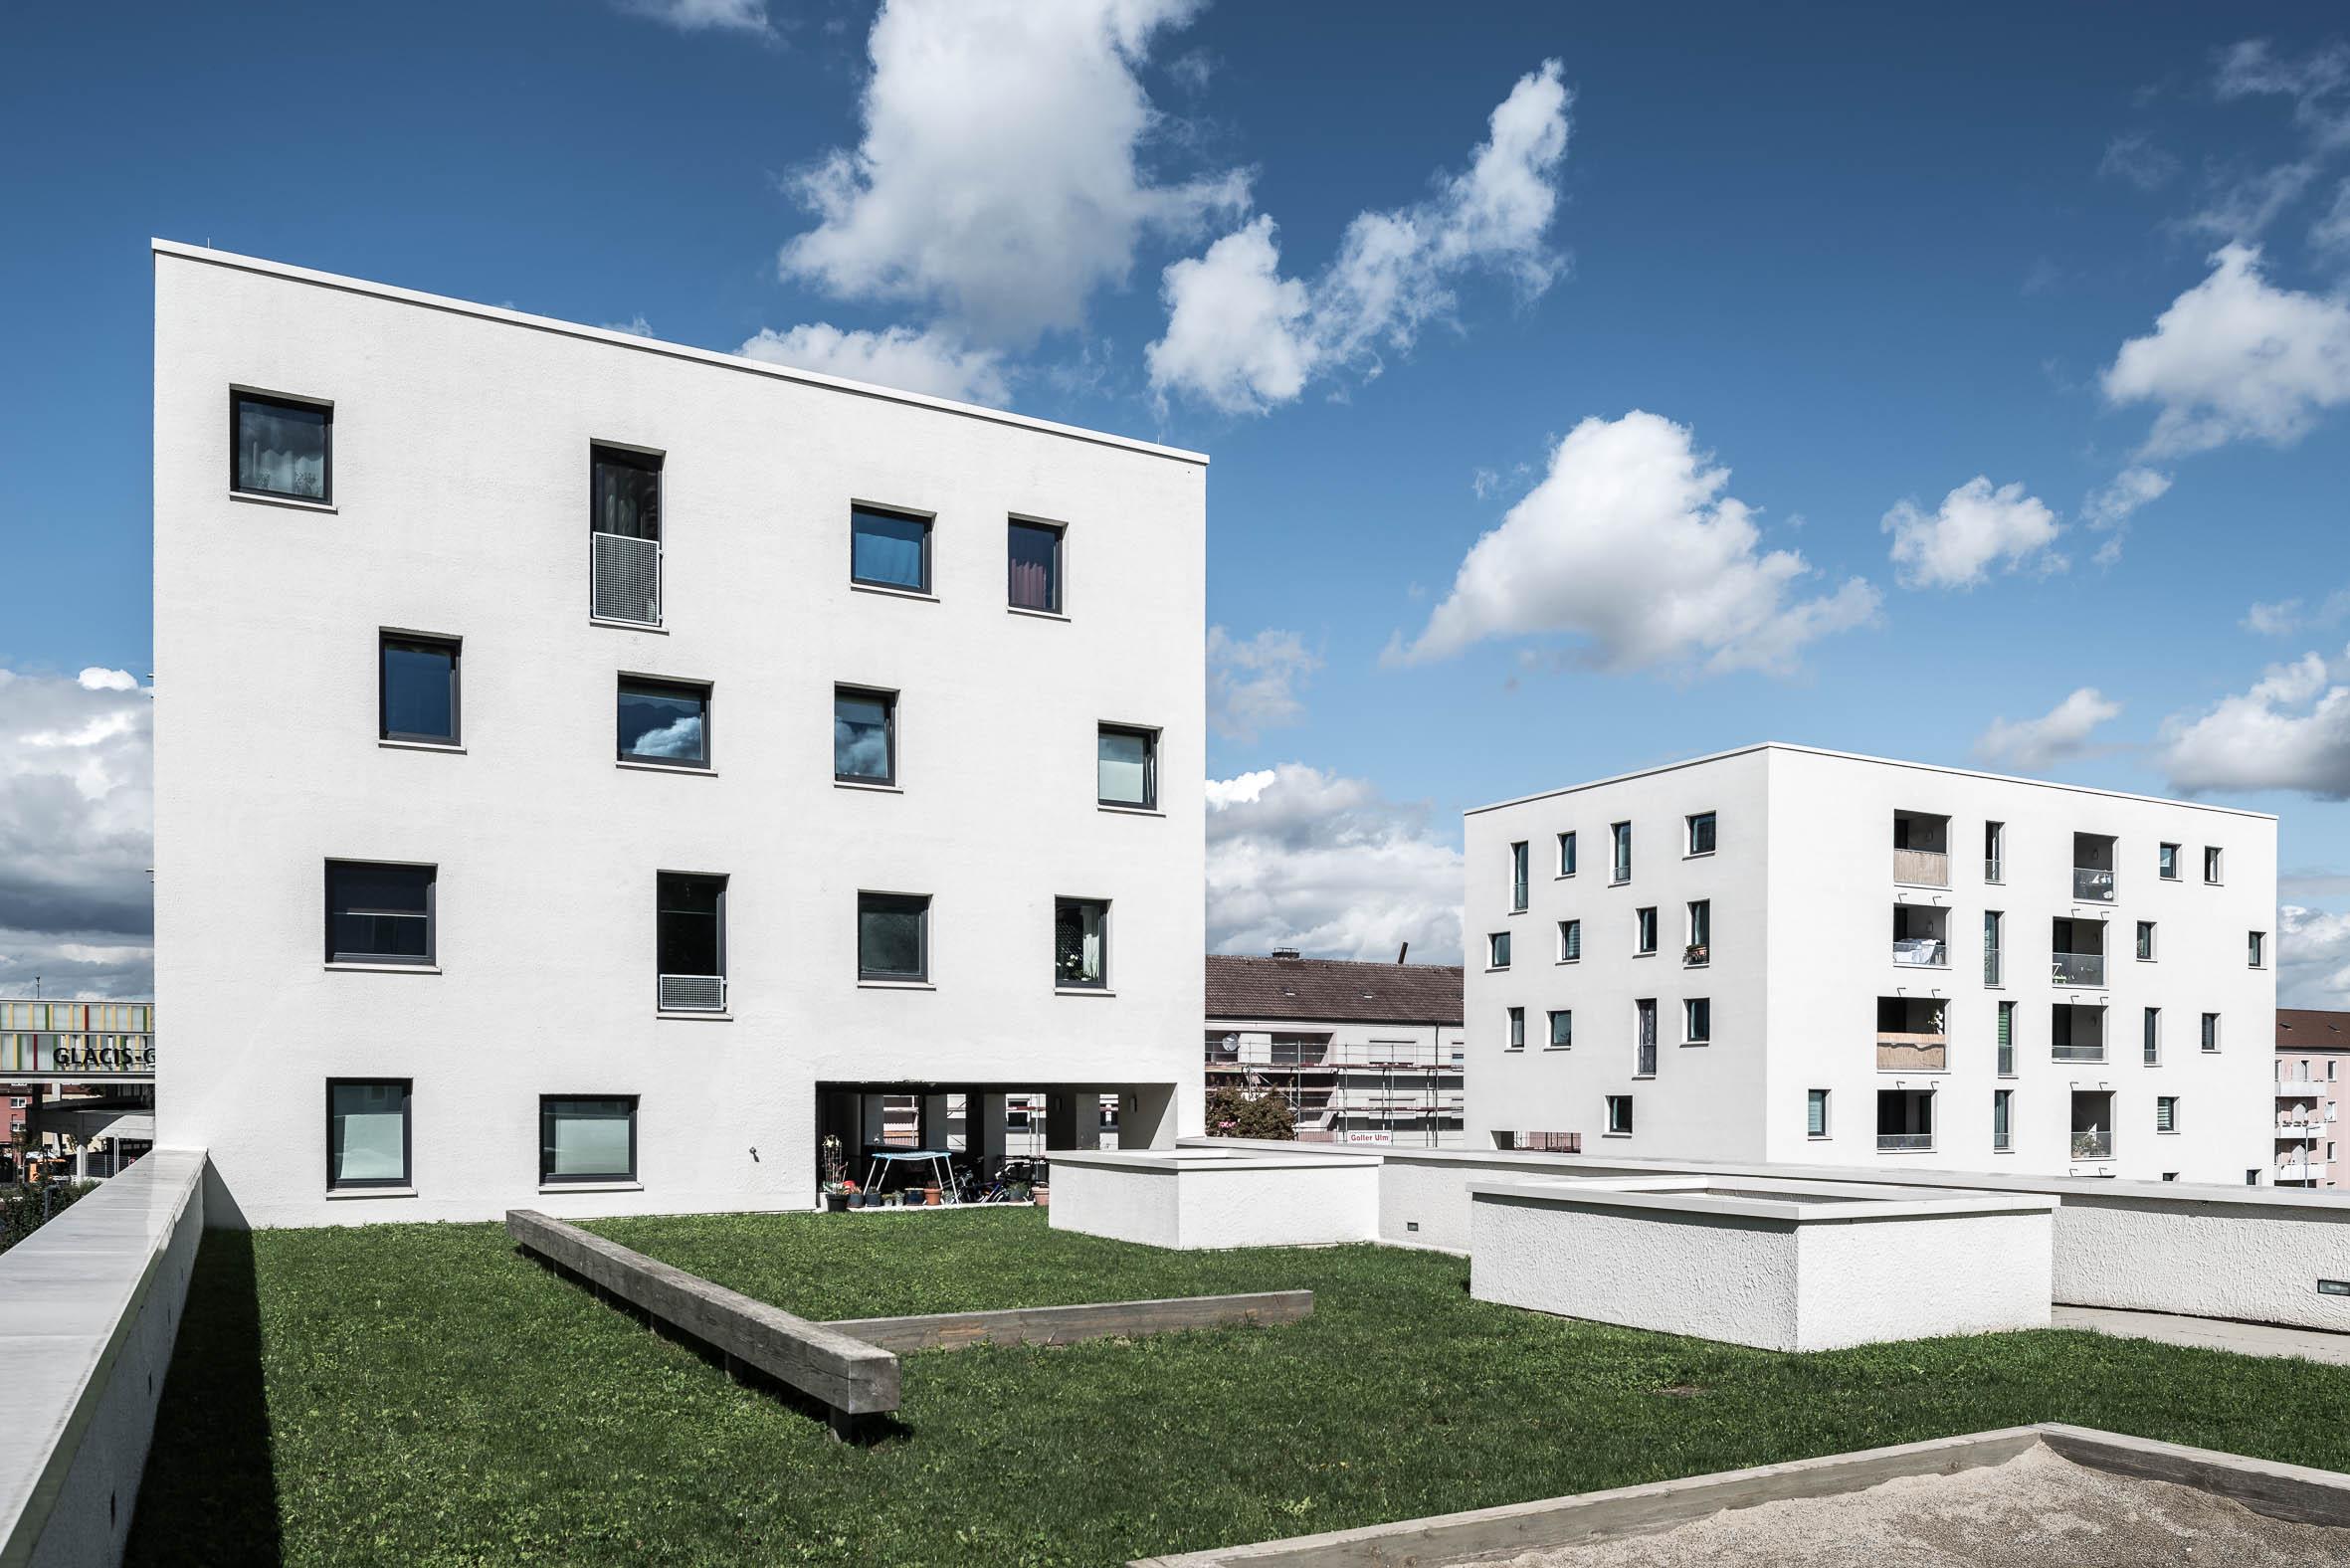 Architekturfotografie Jules Et Jim Neu Ulm Bauwerk